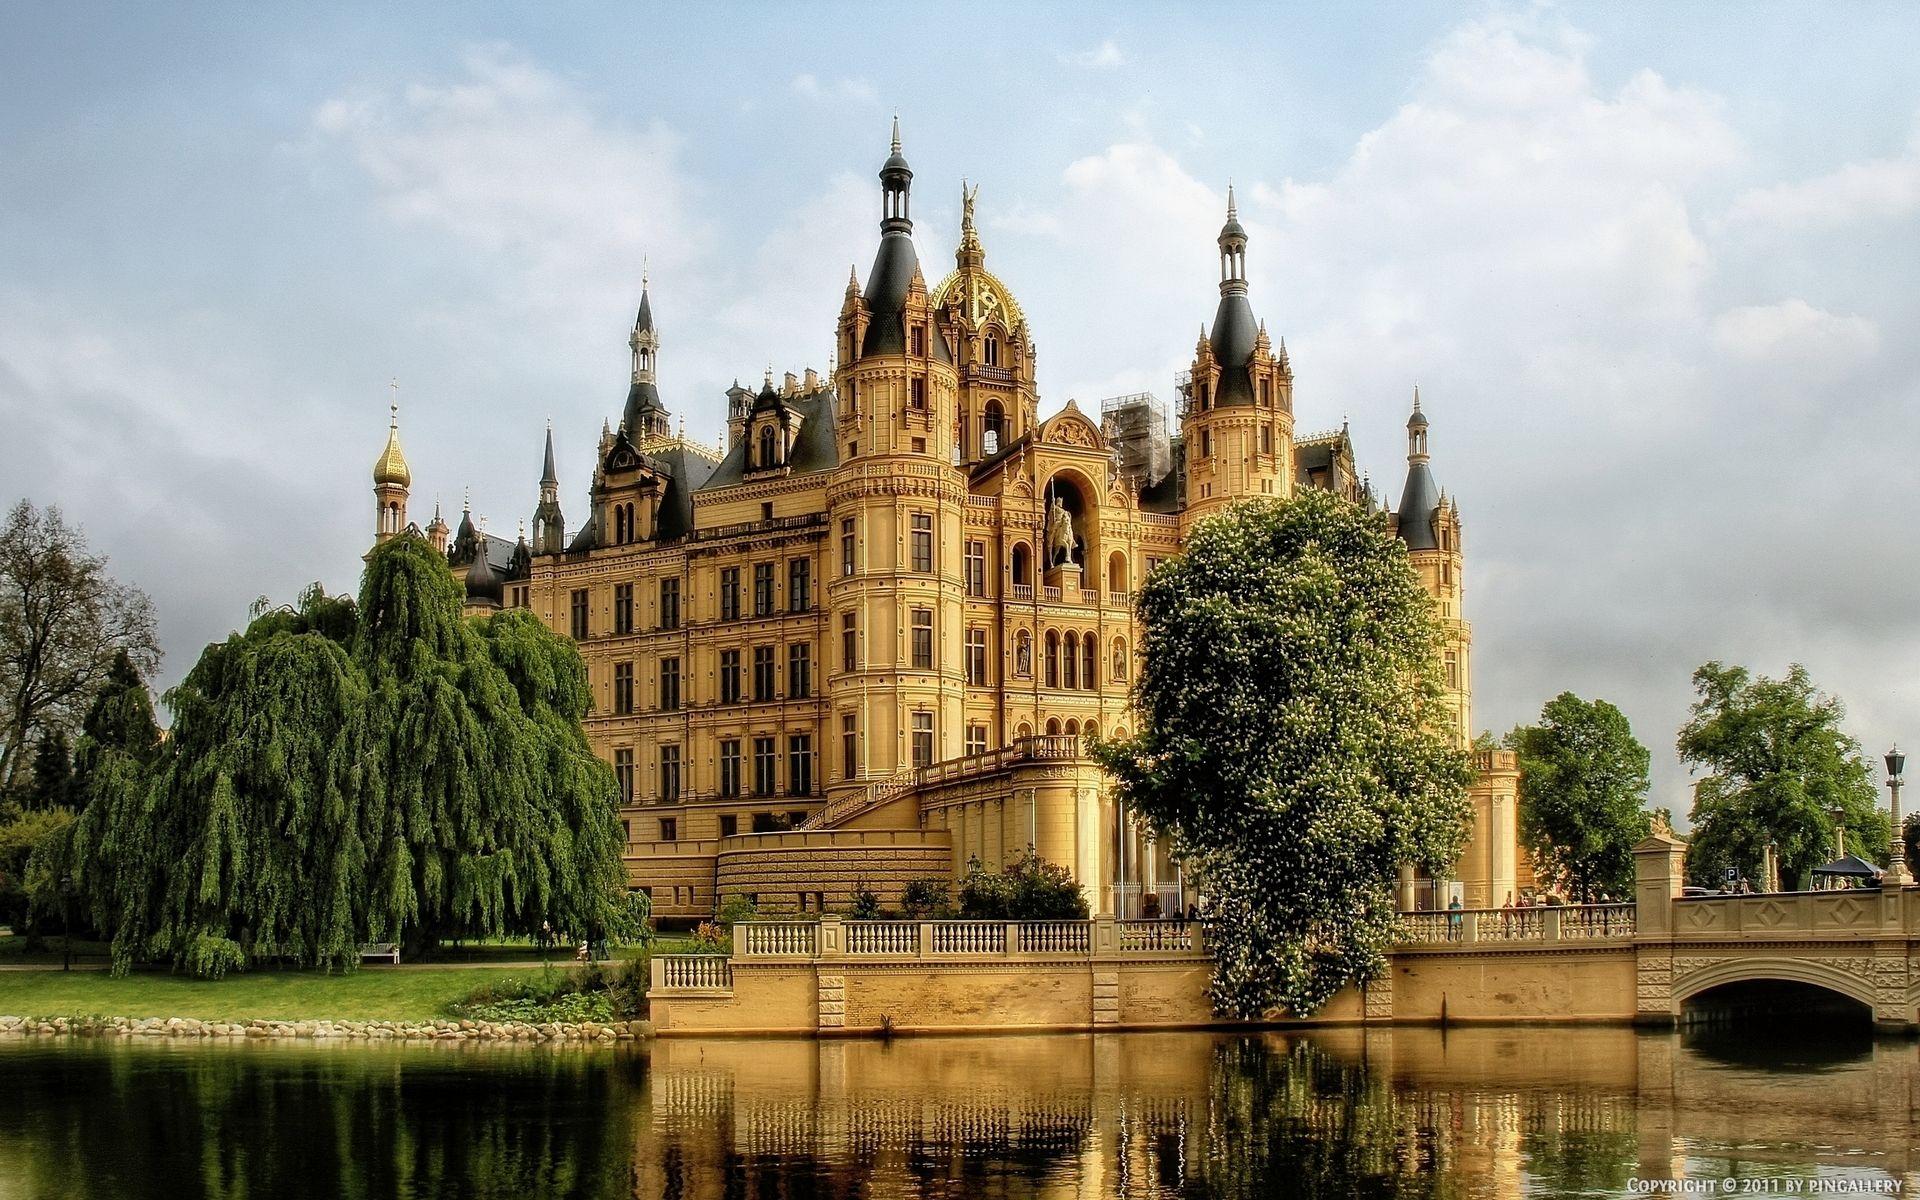 1920x1200 Wallpaper Germany Schwerin Castle Water Trees Deutschland Burgen Schwerin Schweriner See